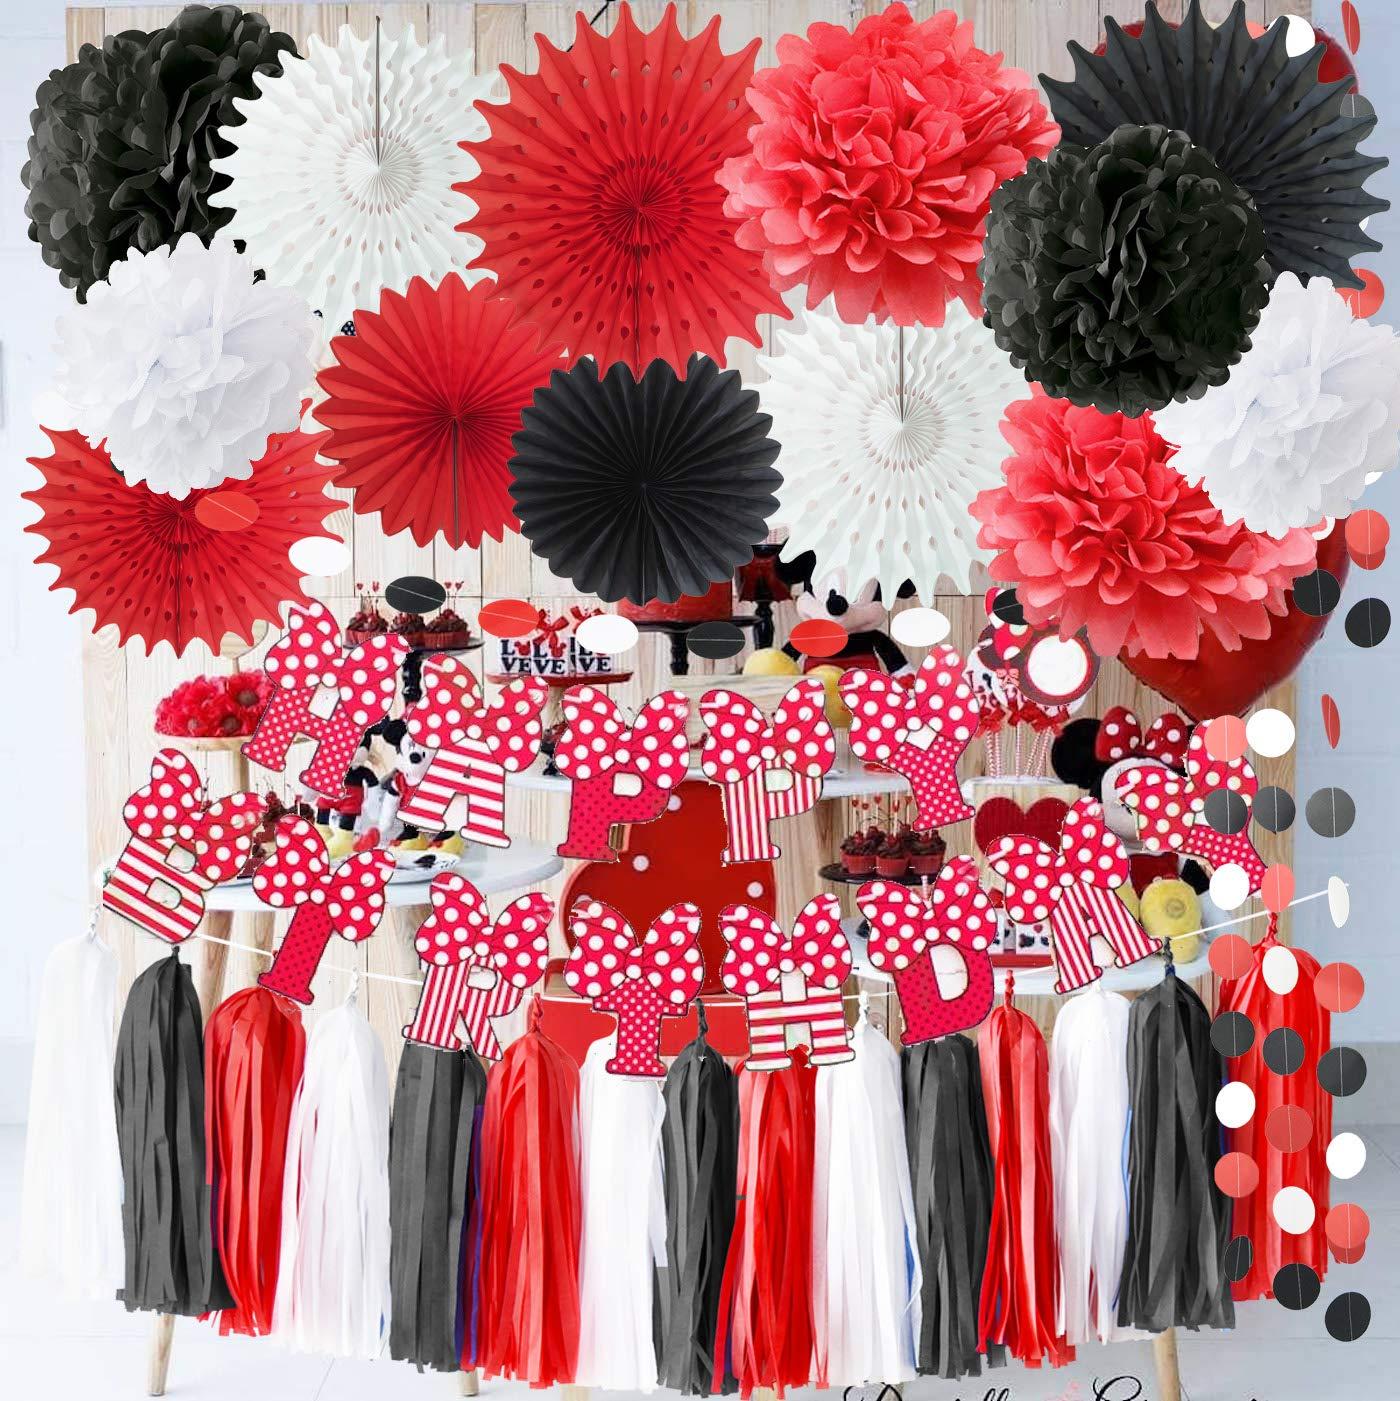 Red Minnie Mouse Party Supplies - Decoración para fiesta de ...